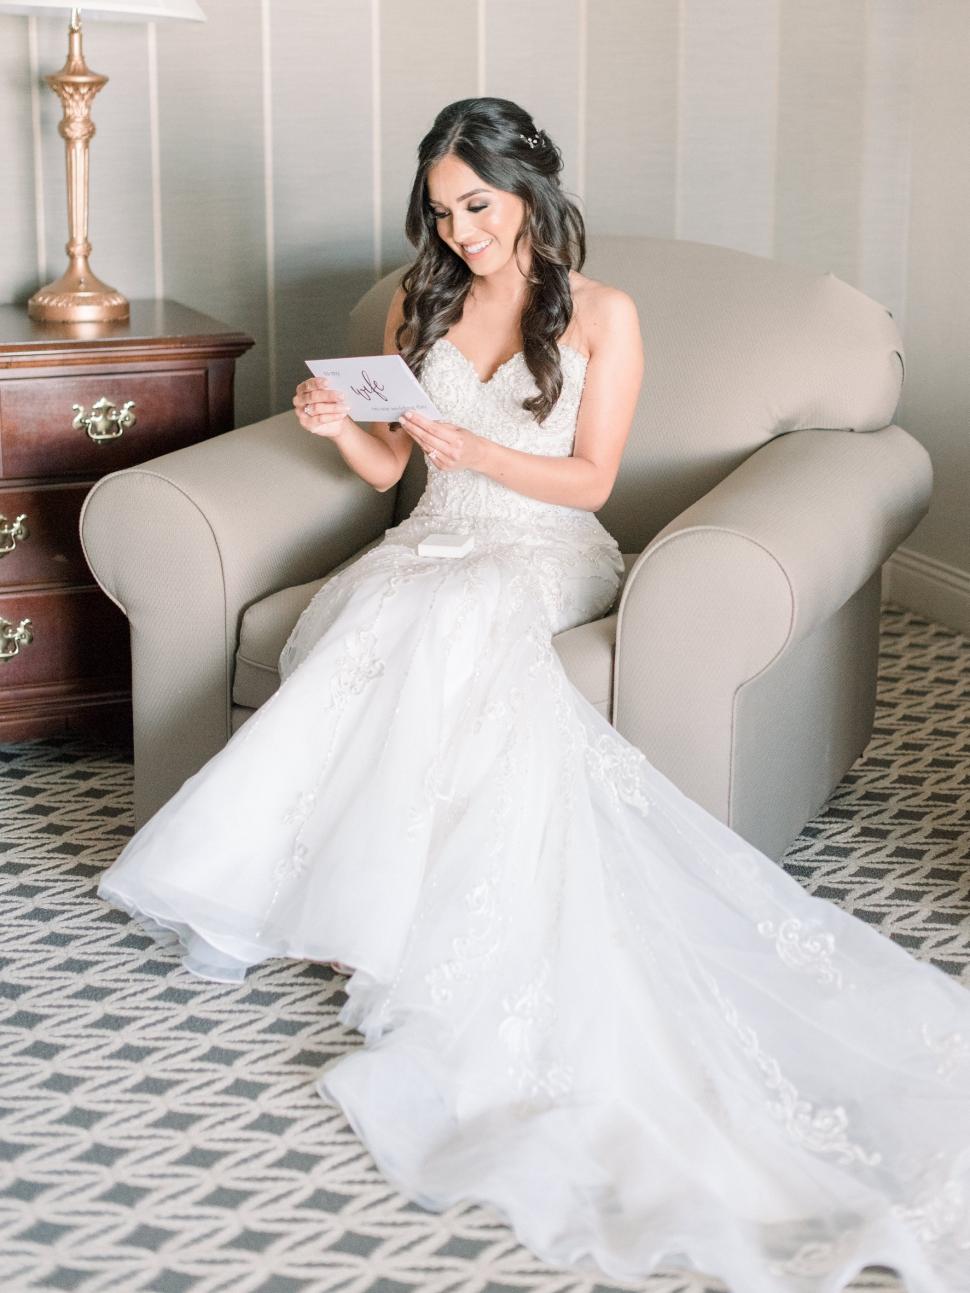 The-Madison-Hotel-Wedding-Photographer-Morristown-NJ-Photographer-Cassi-Claire_08.jpg